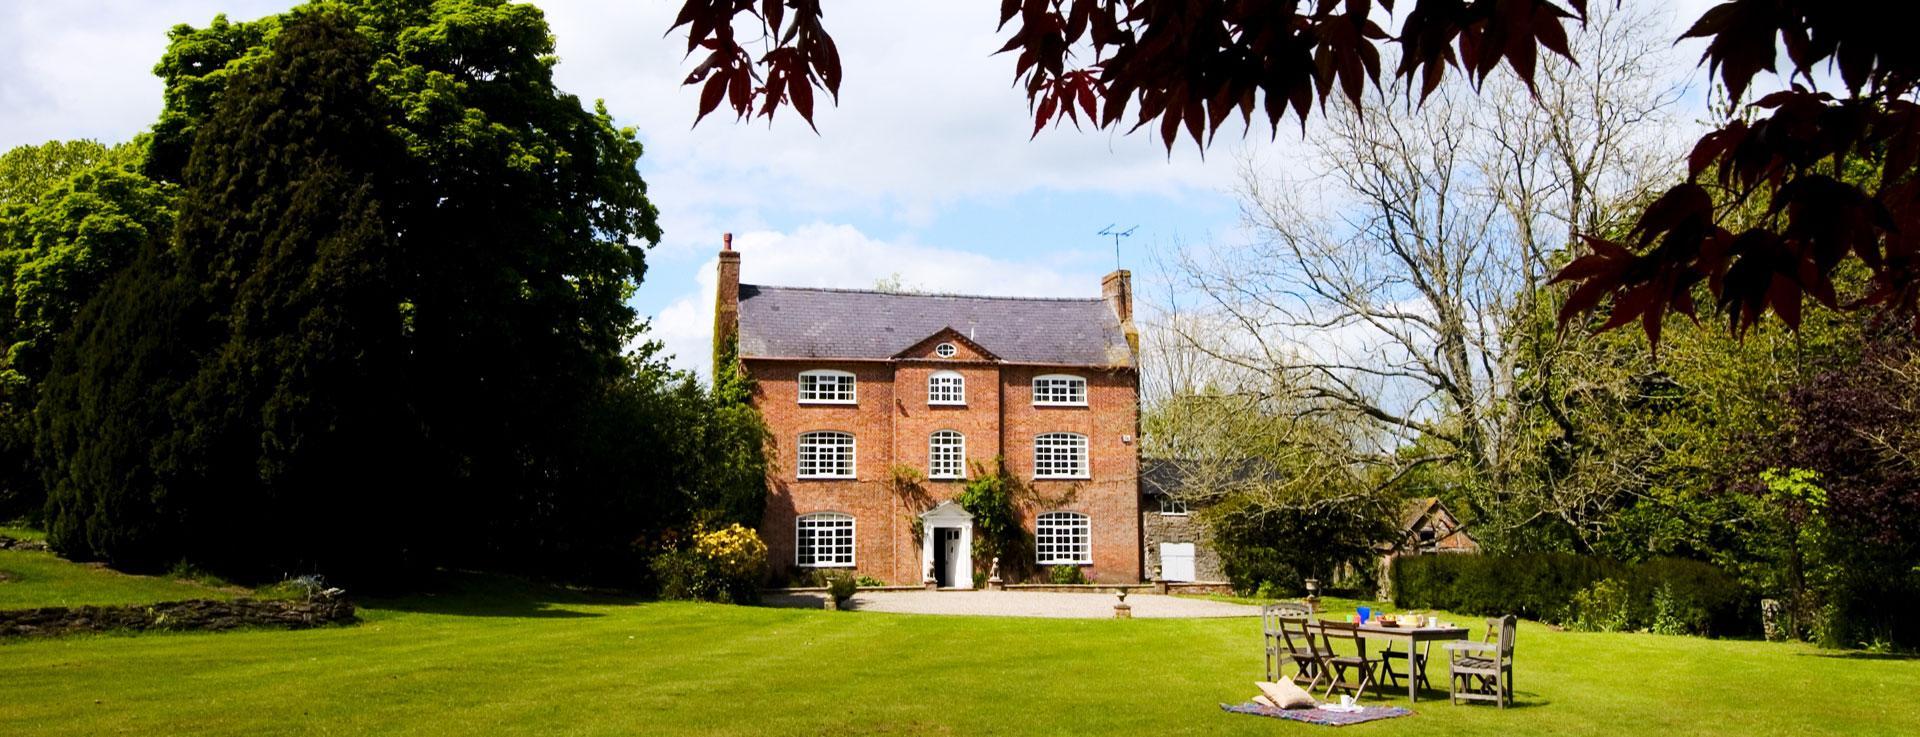 The Sherriffs group accommodation